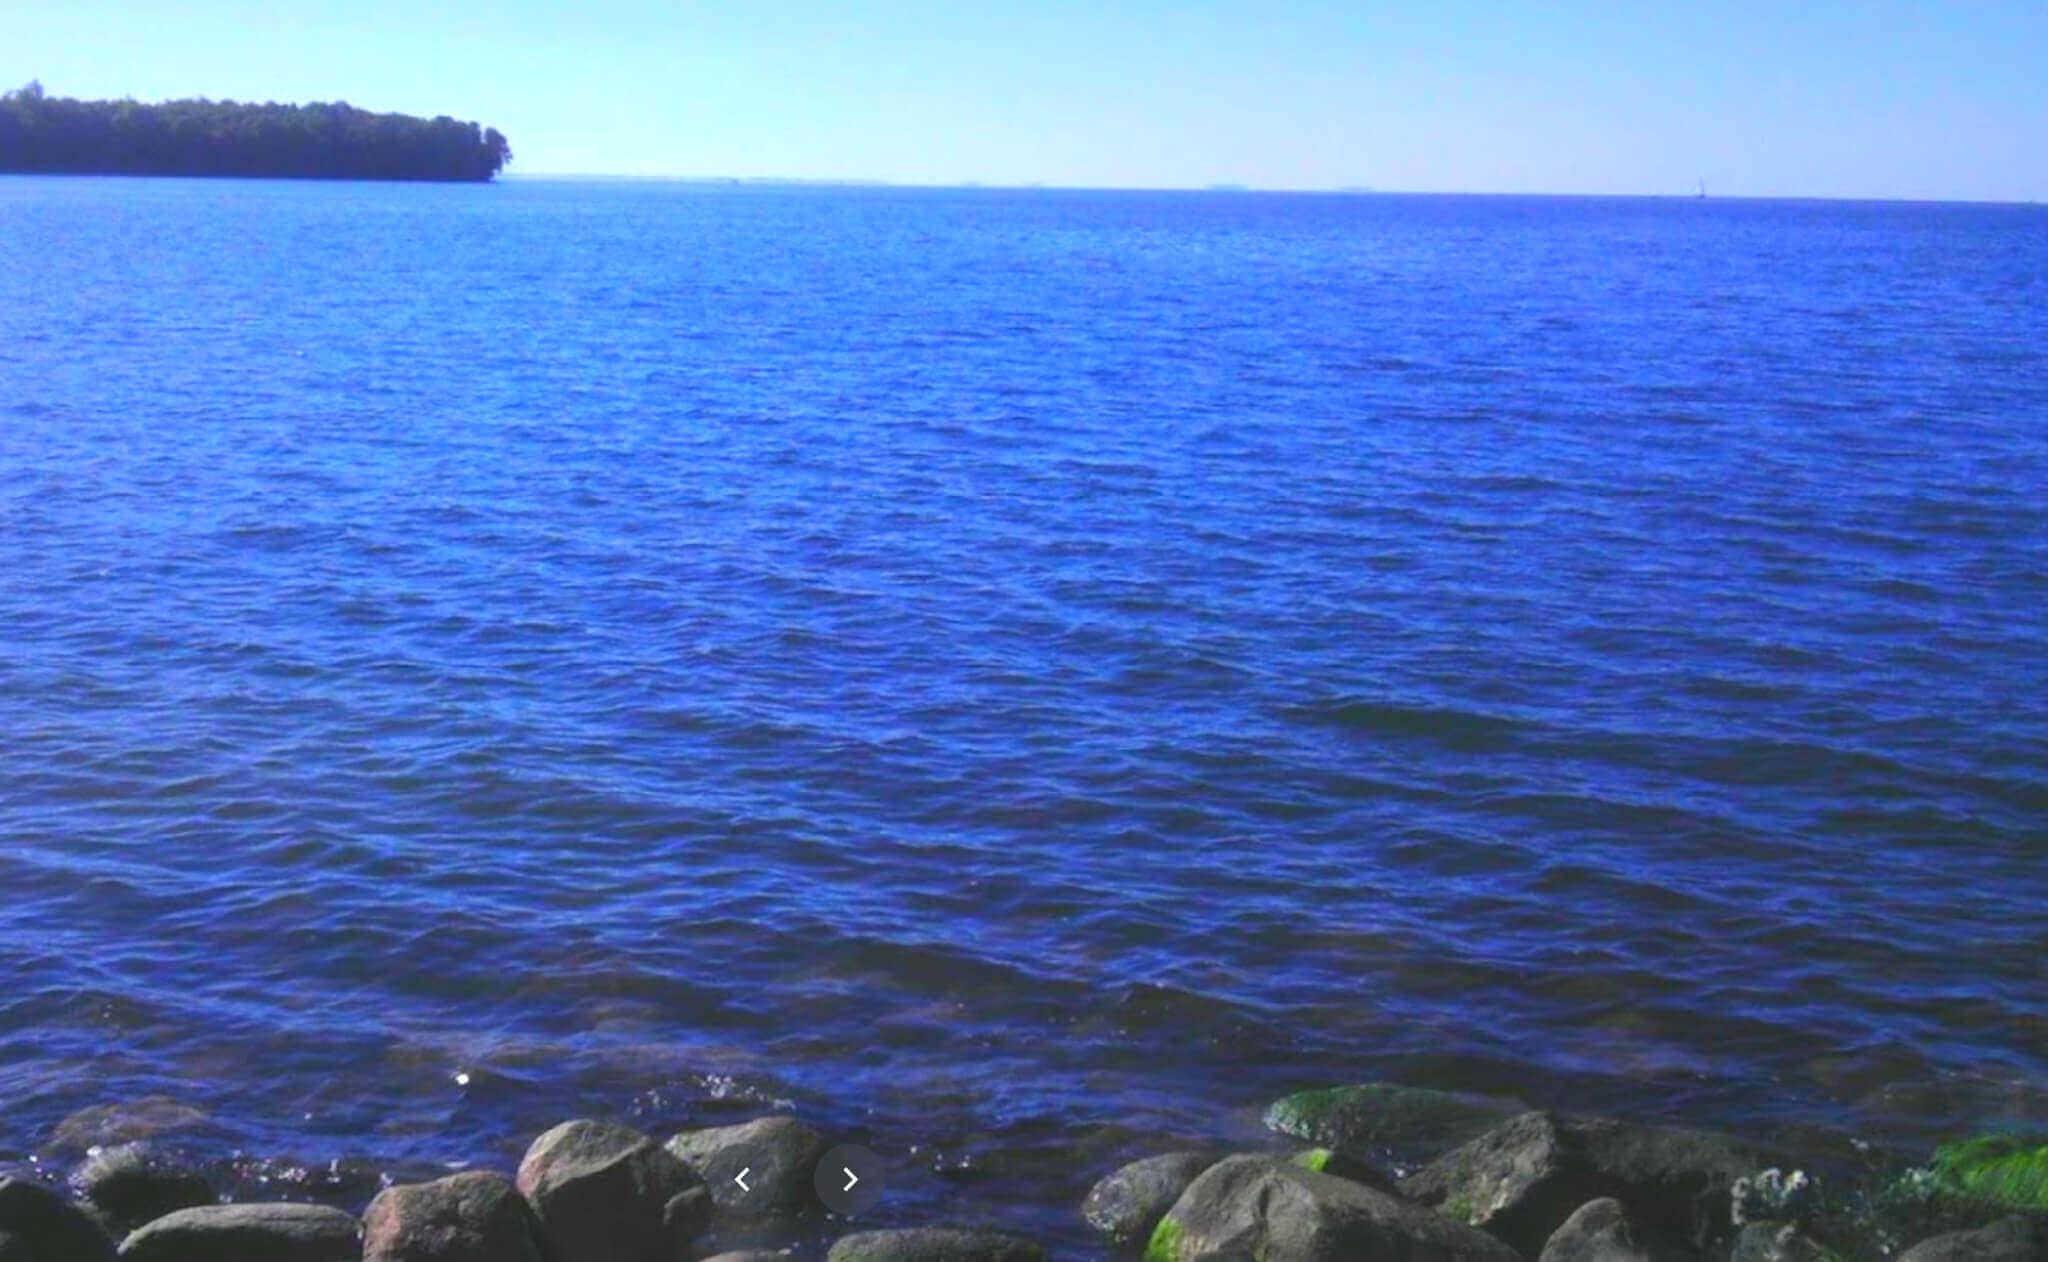 Mille-Lacs-Lake-Fishing-Report-Guide-Minnesota-MN-03